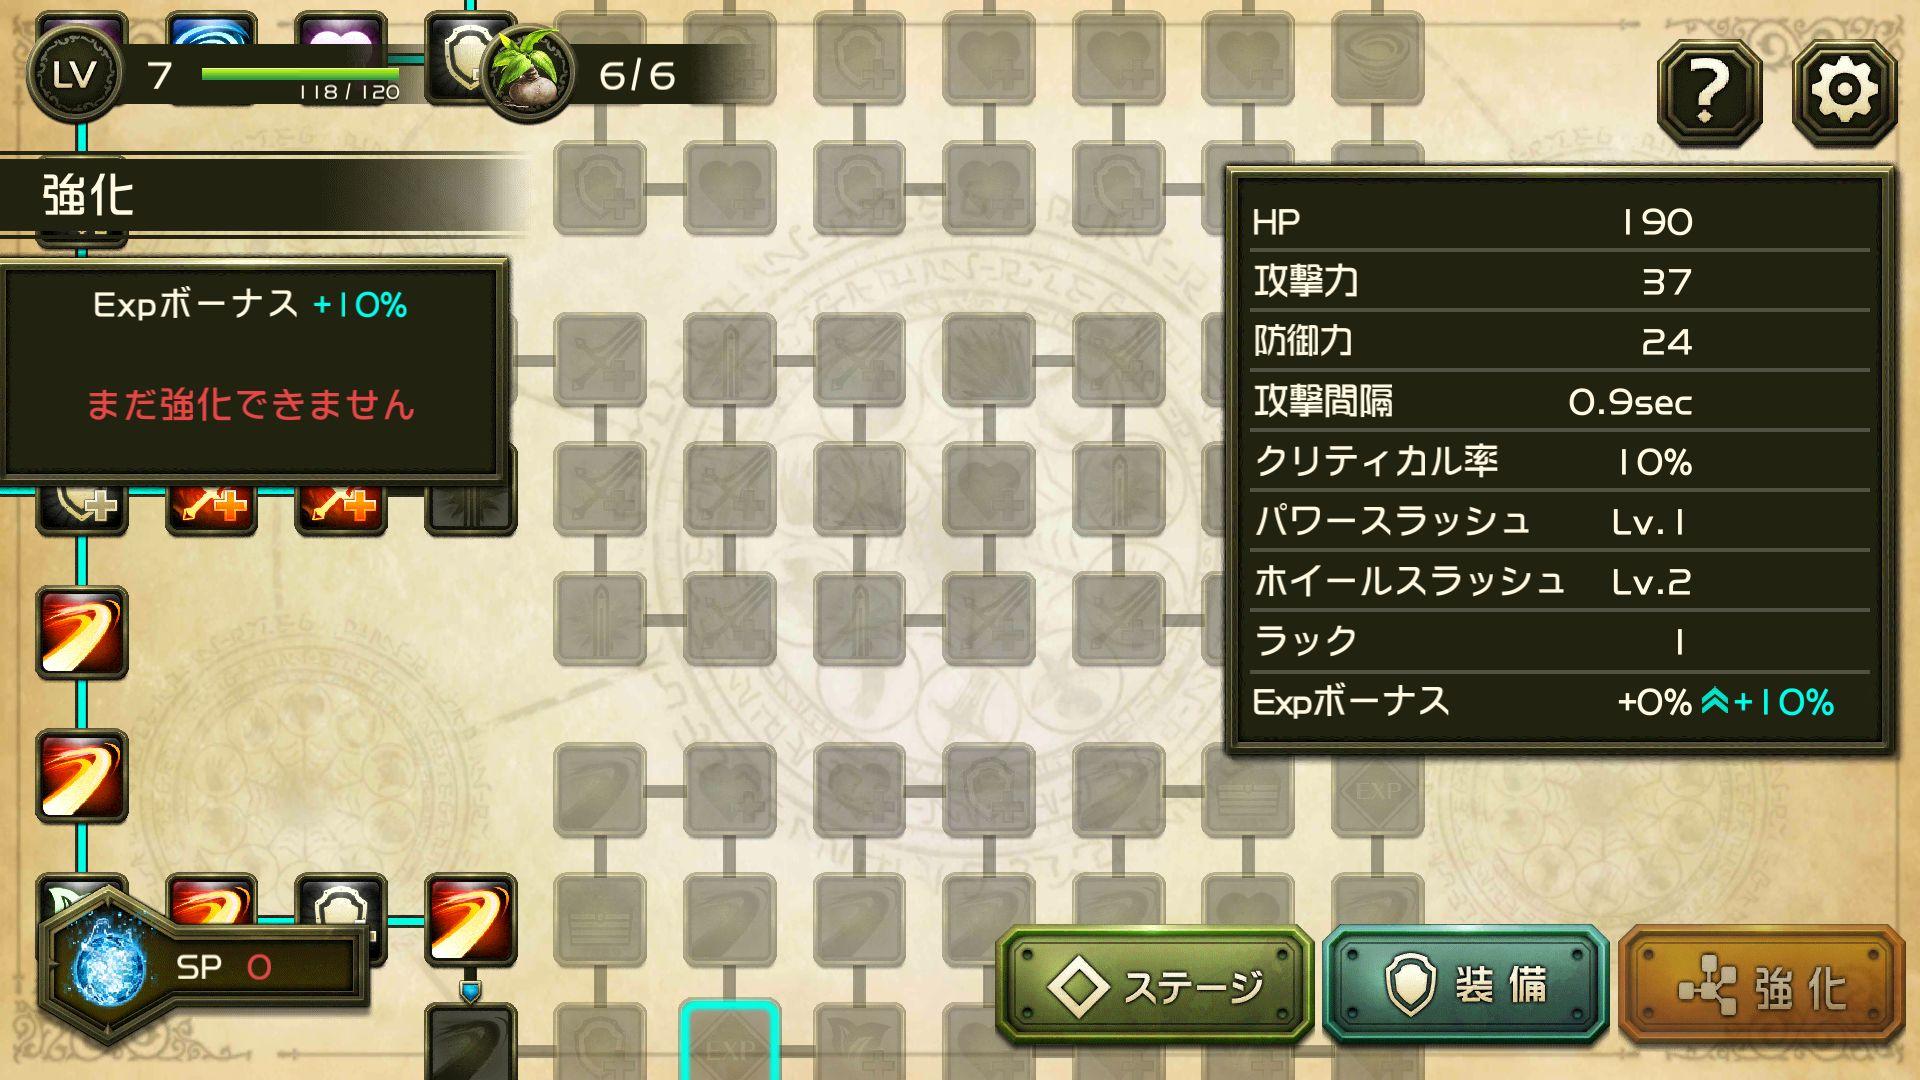 androidアプリ ガーディアン オブ ソリチュード(Guardian of Solitude)攻略スクリーンショット5